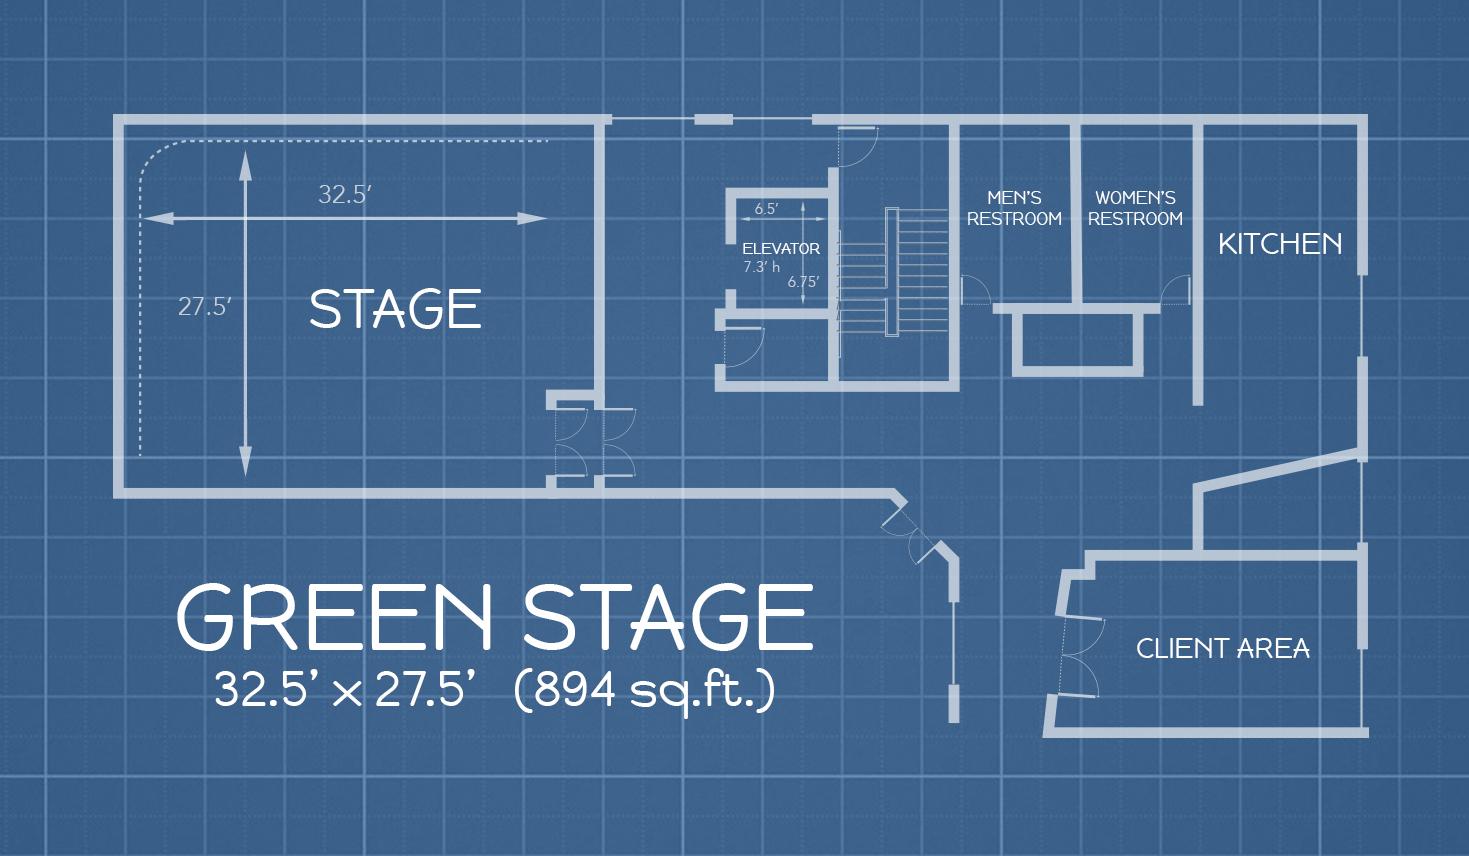 022318_GreenStage.jpg